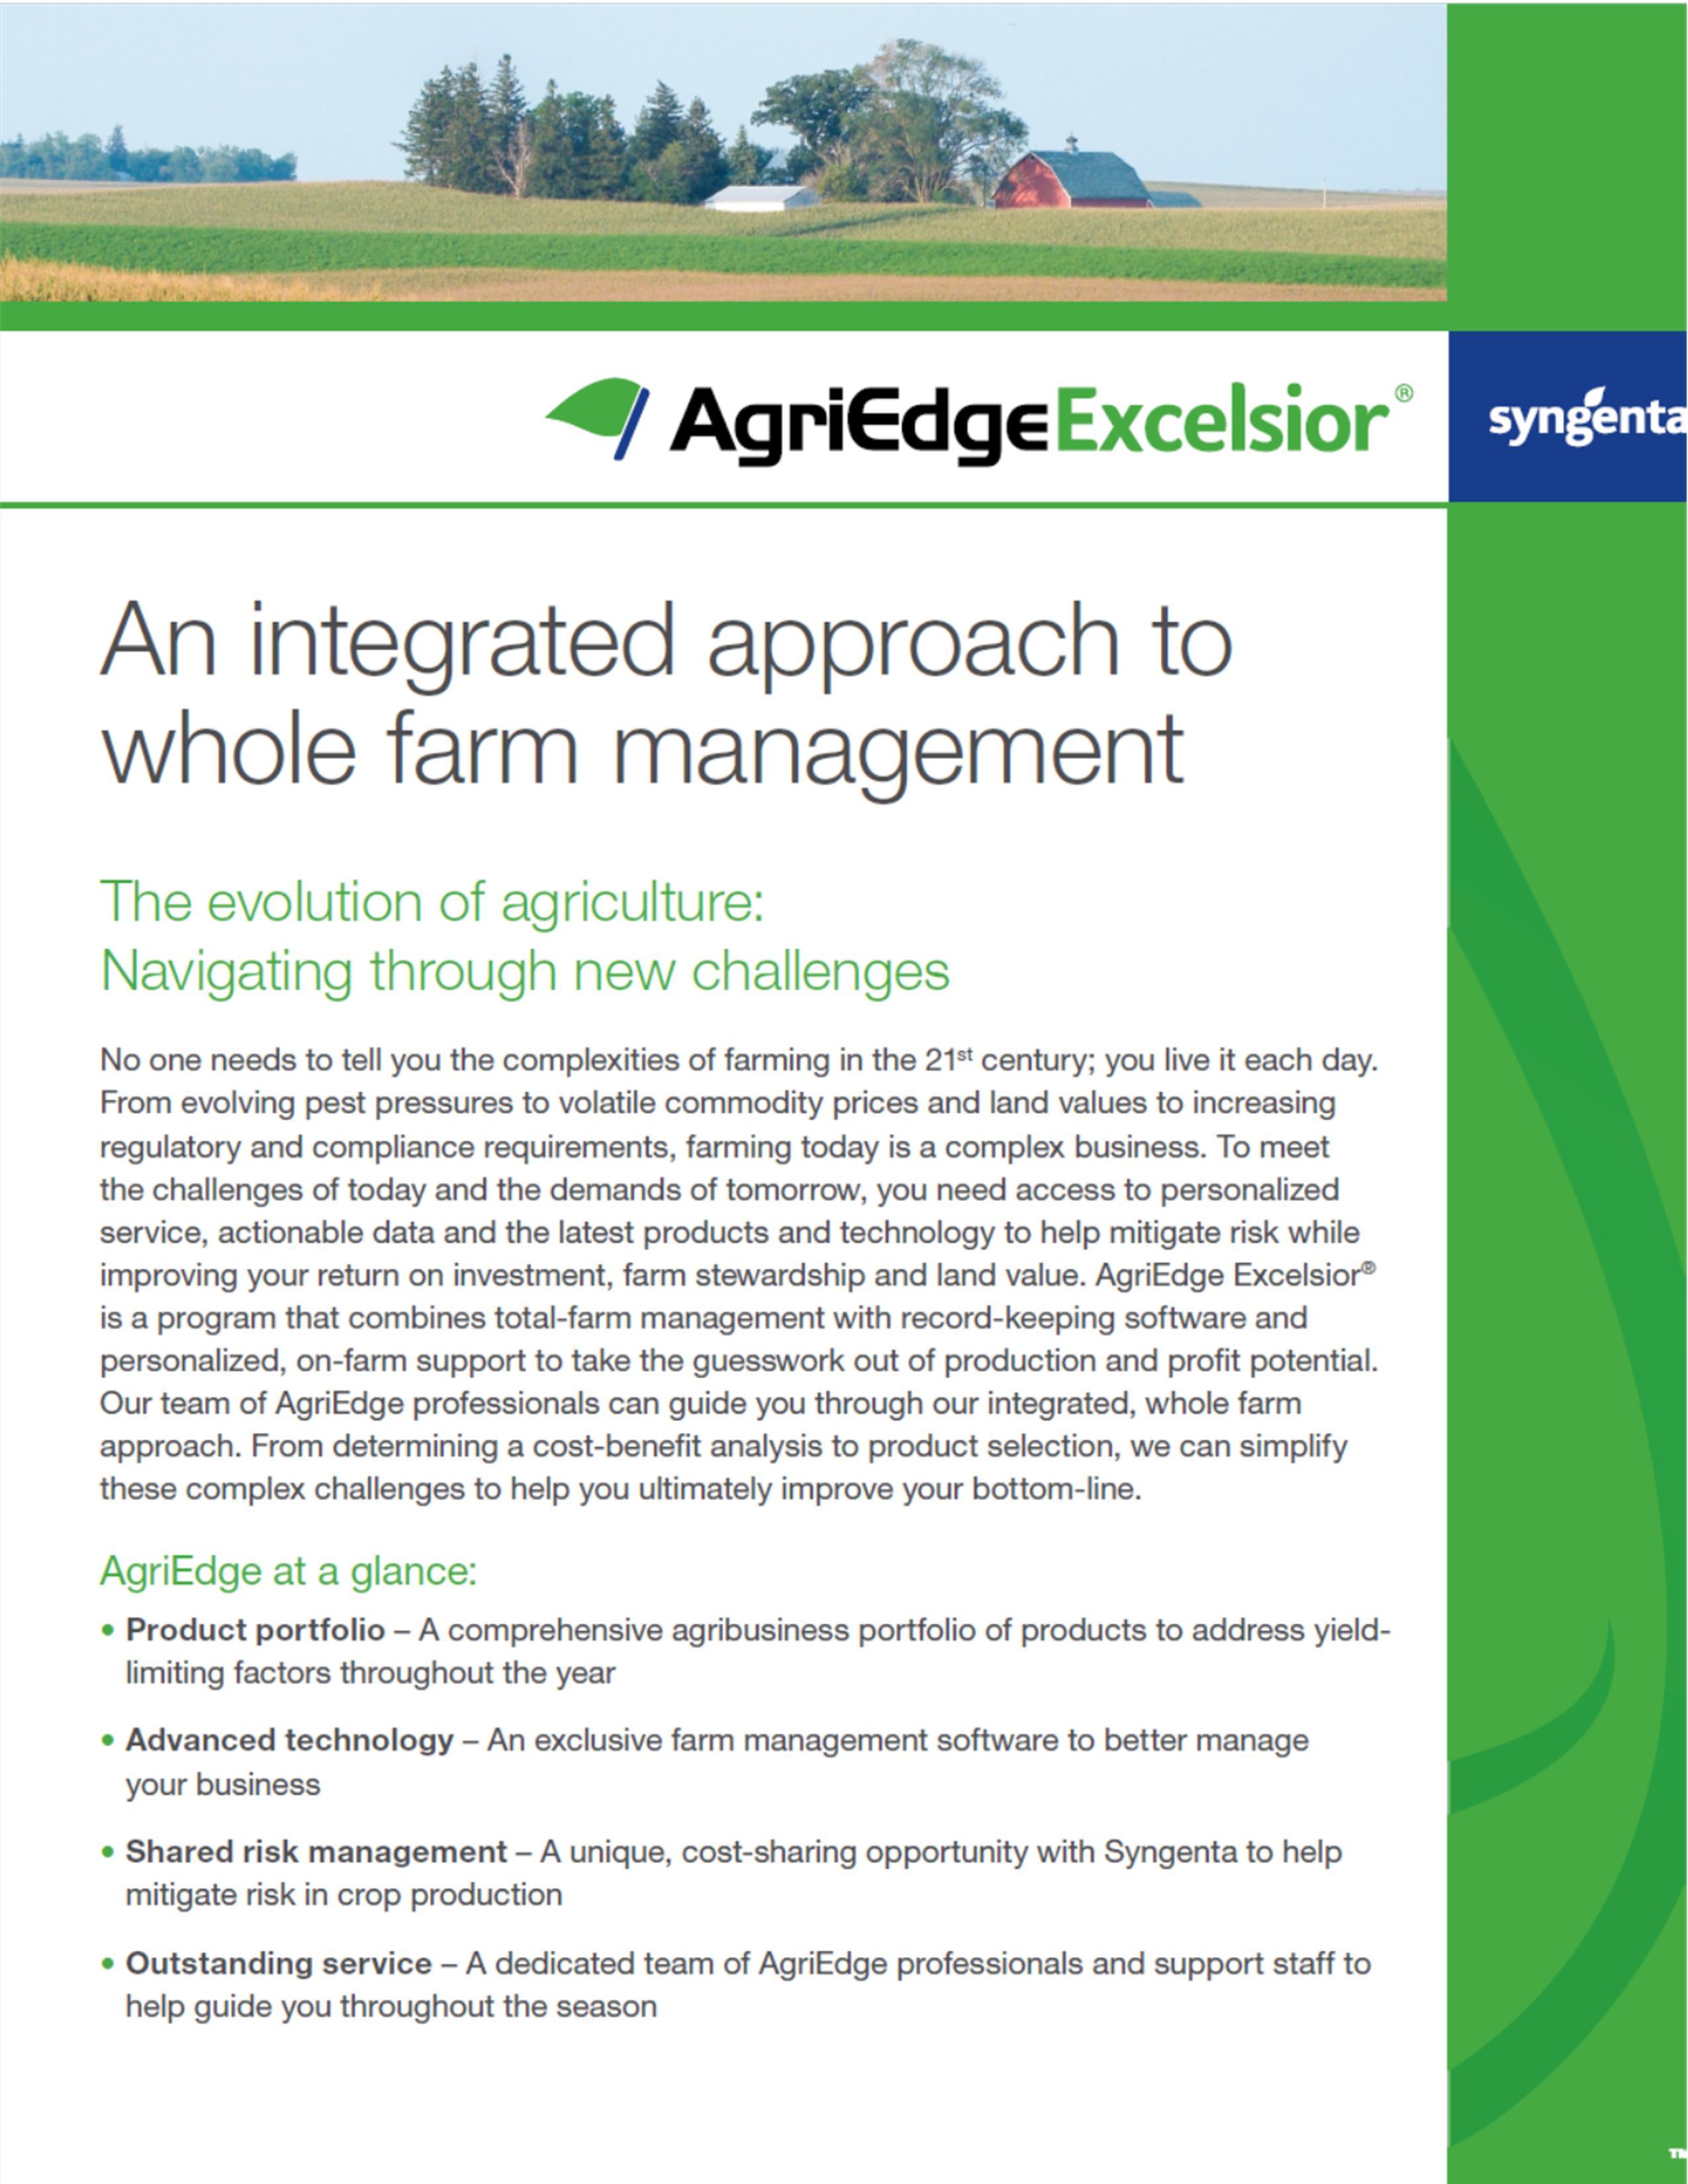 AgriEdge-Excelsior-Multicrop-AgriEdge-Excelsior-Brochure1